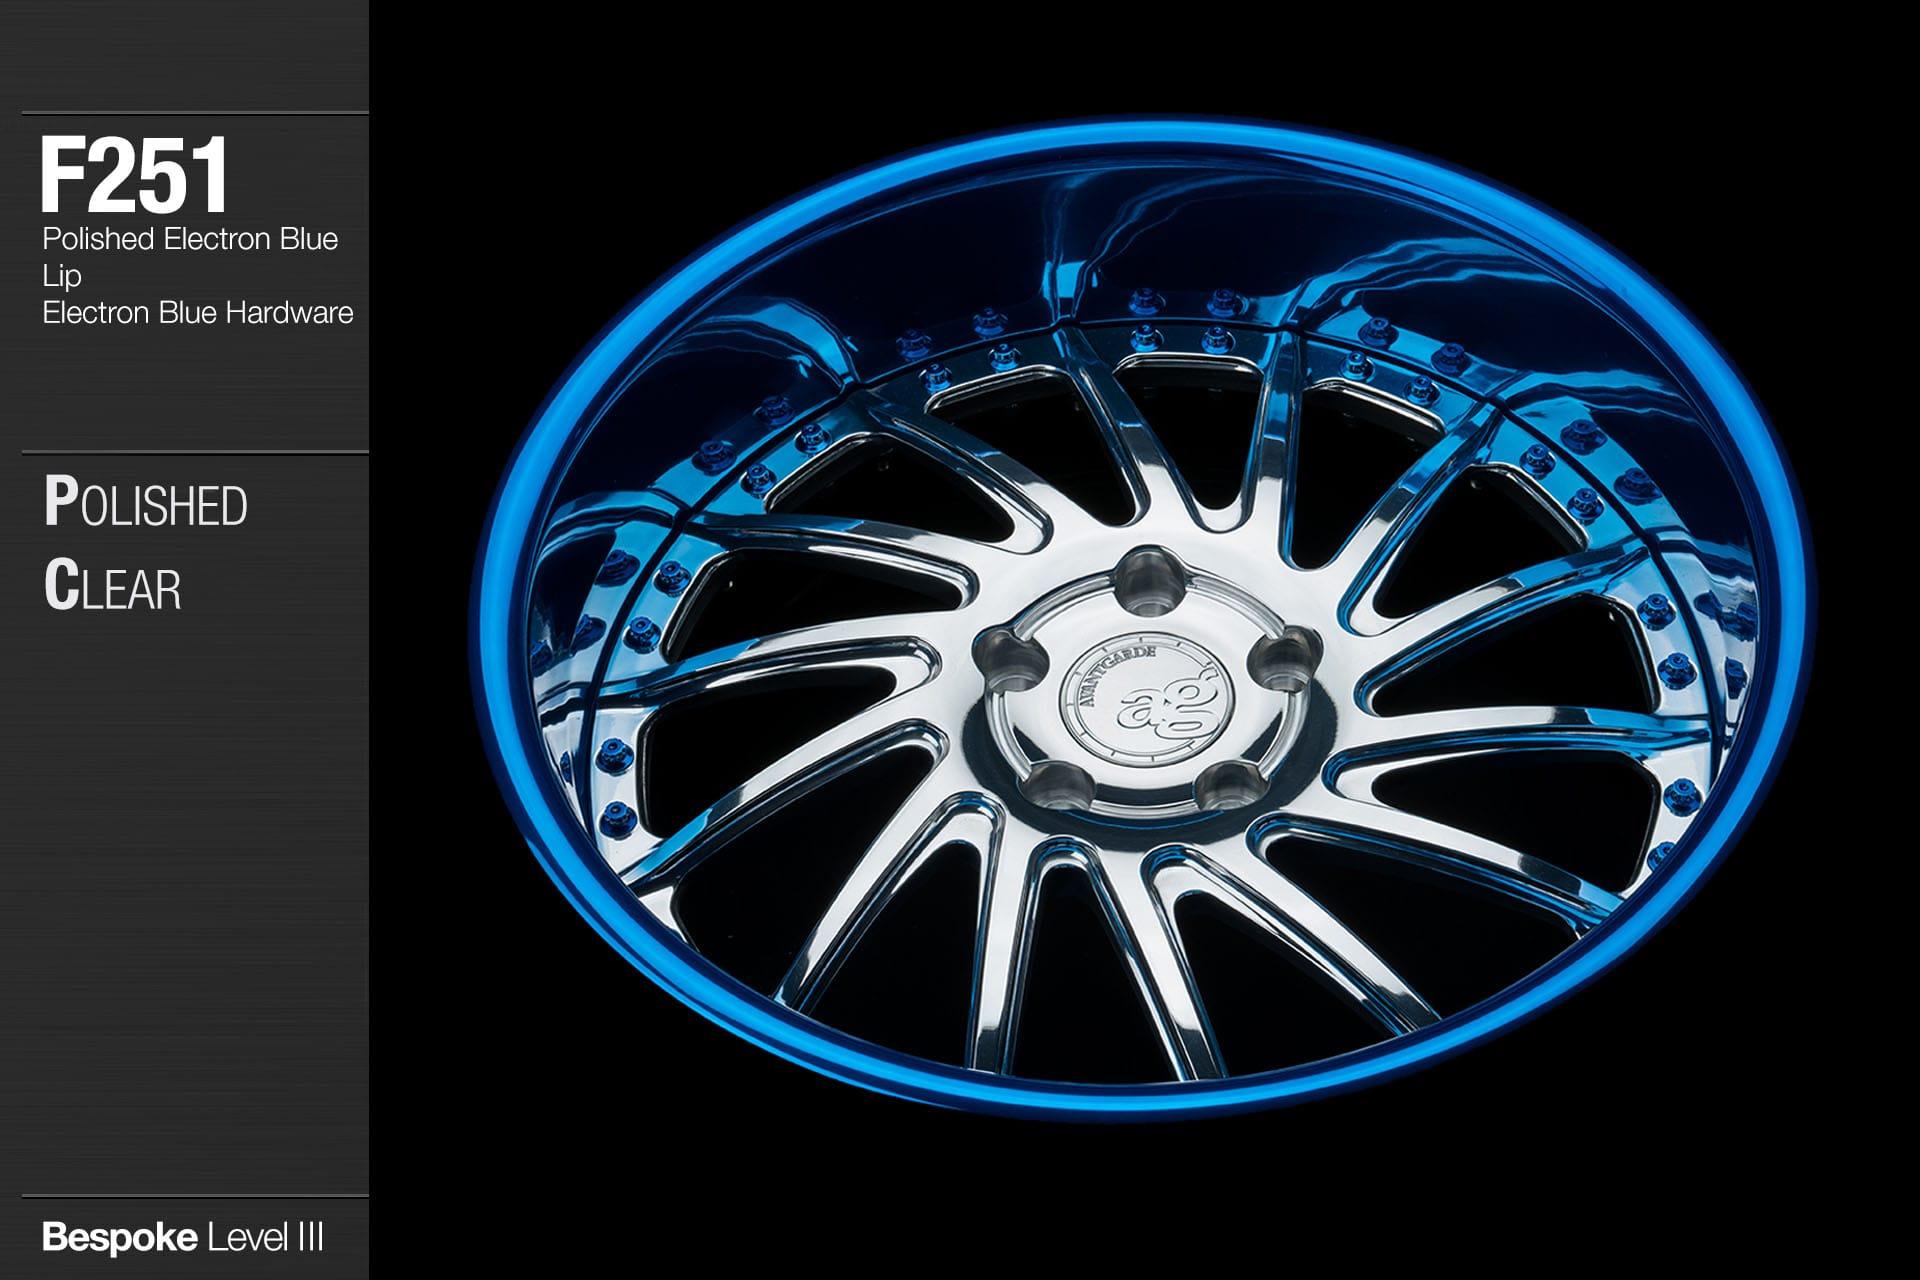 avant-garde-ag-wheels-f251-polished-clear-face-polished-electron-blue-lip-hardware-3-min